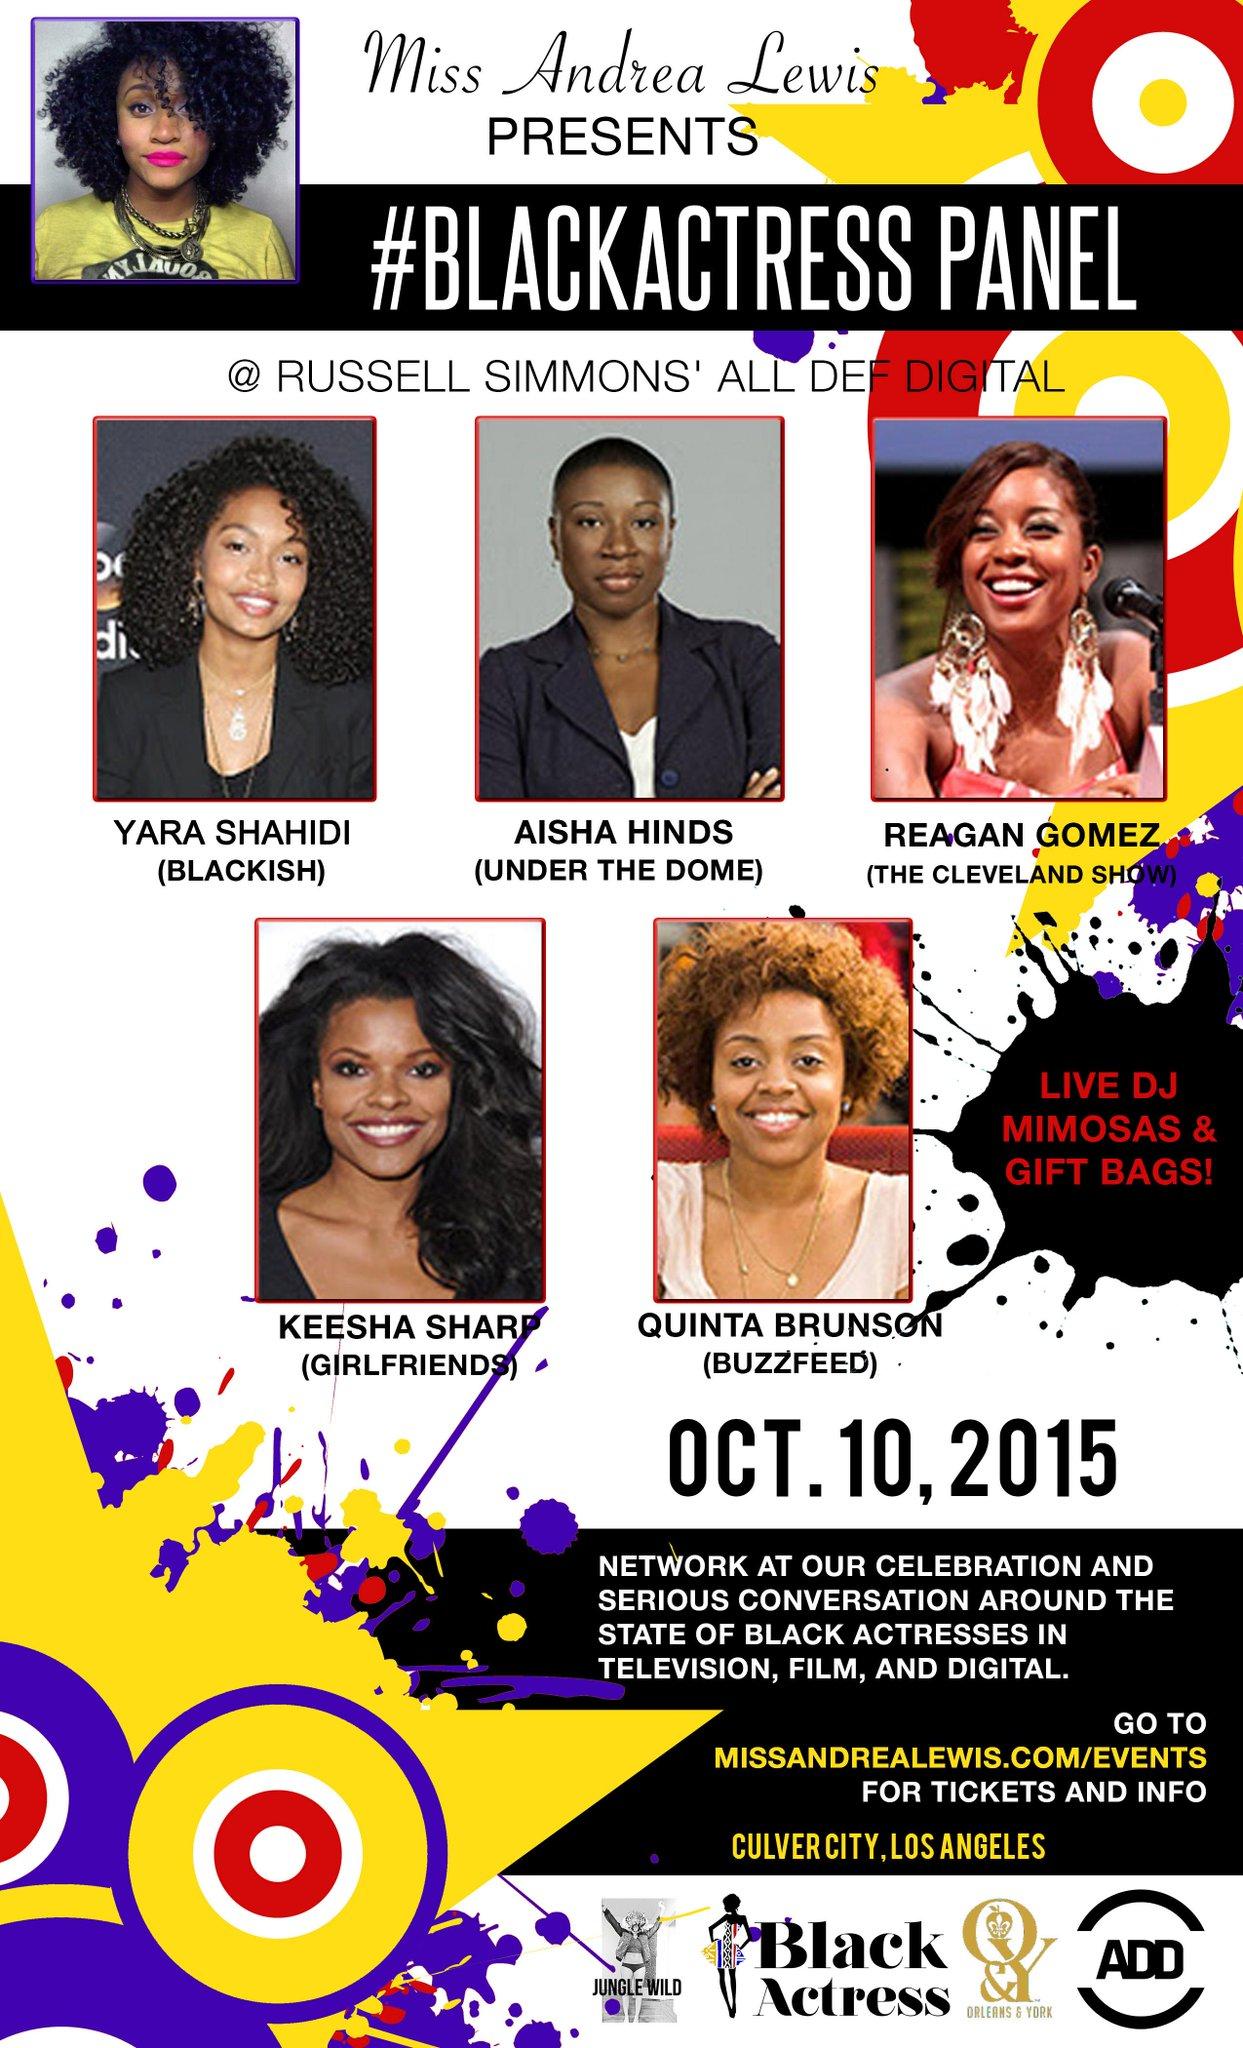 RT @AllDefDigital: This Sat. join us + @missandrealewis for the Black Actress Panel series. #squADD  Register: http://t.co/LeSoKDe9Fr http:…